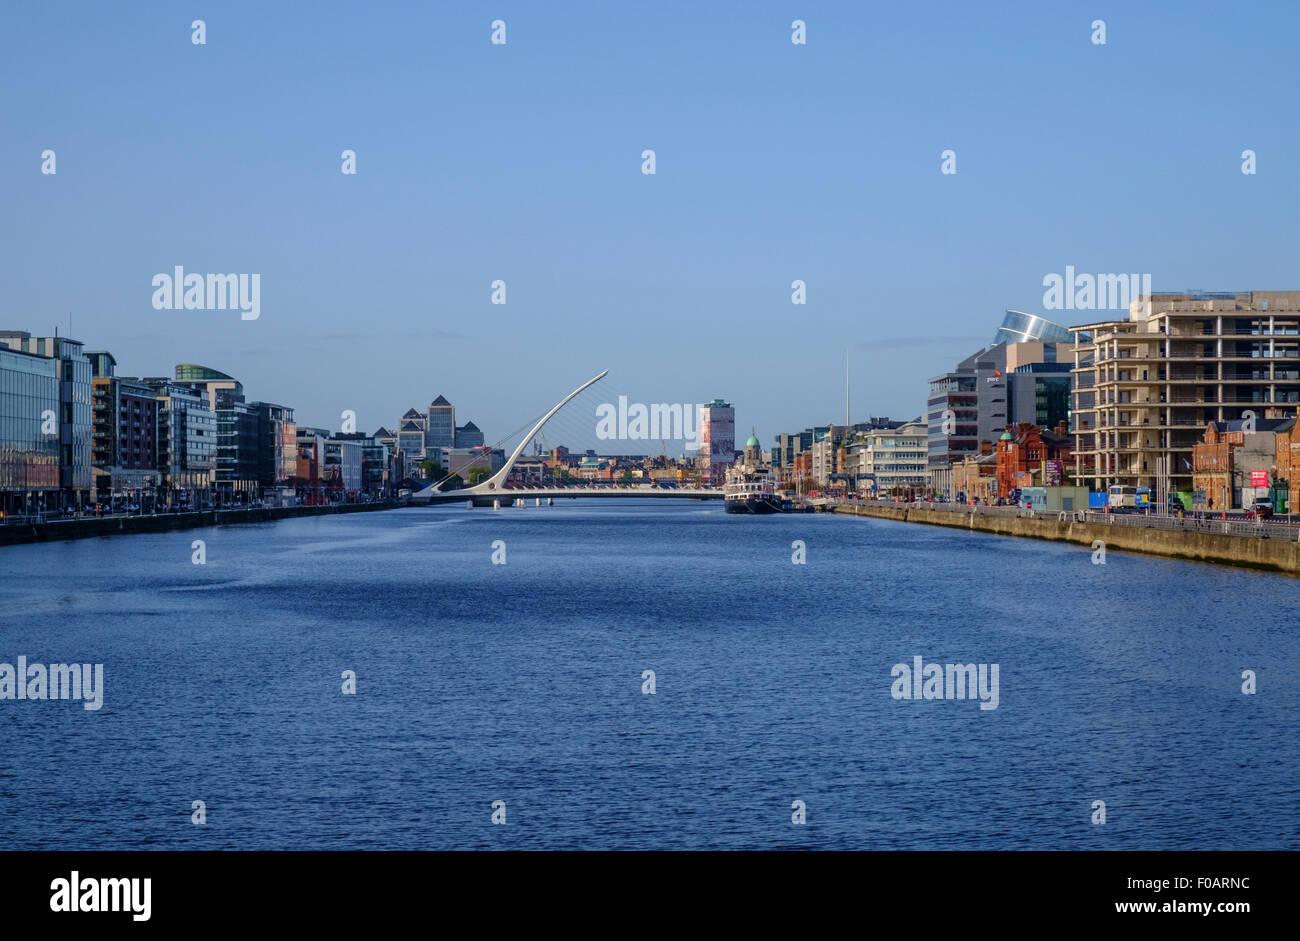 dublin cityscape view river liffey skyline bridge calatrava business district construction quay quays blue sky - Stock Image